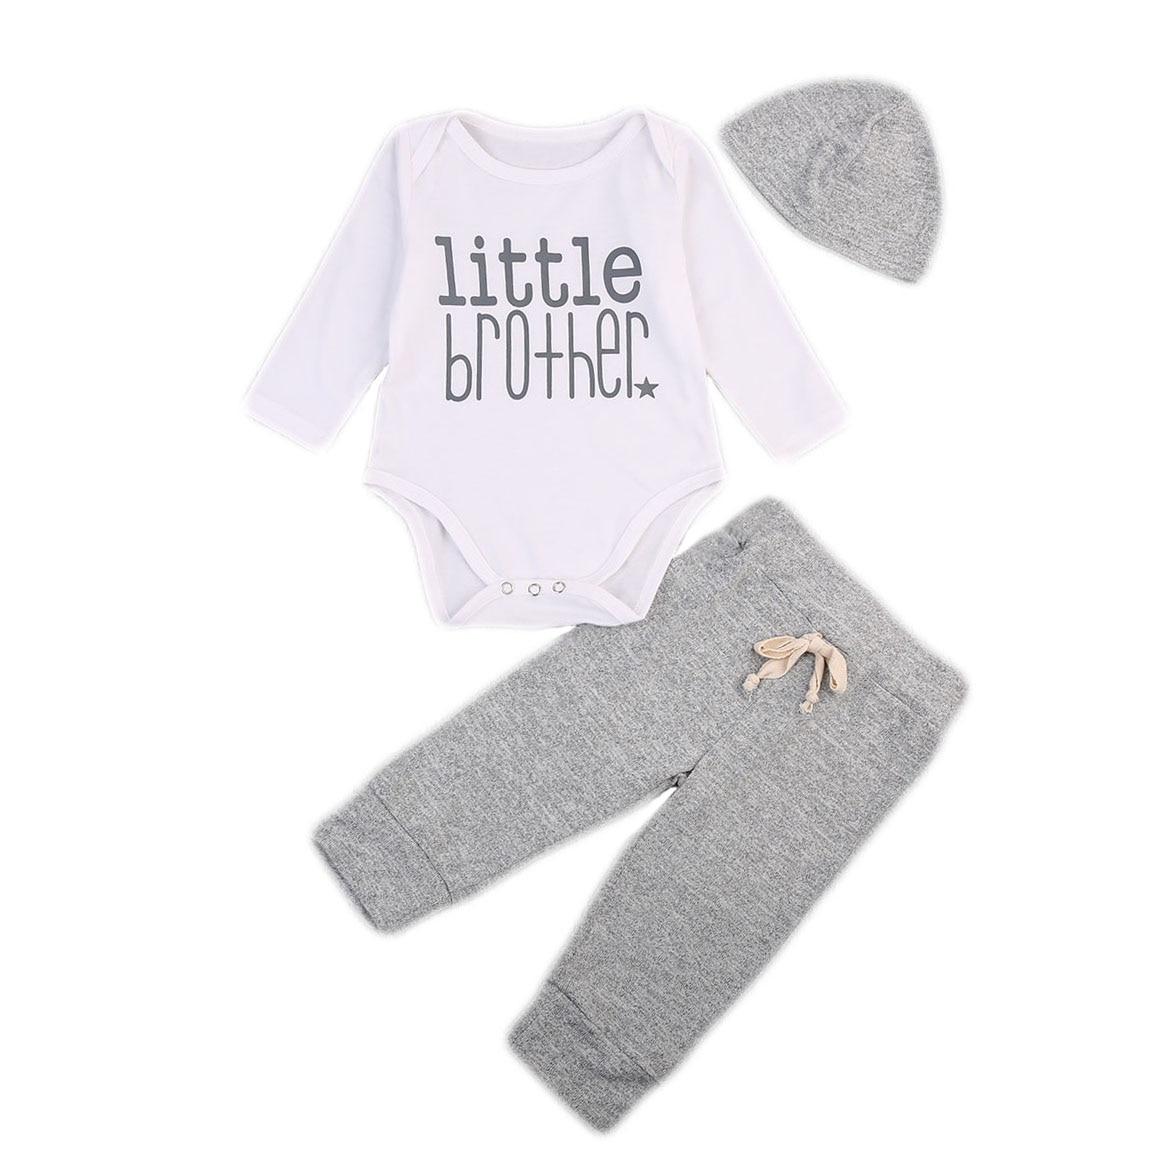 2017 Toddler Kids Baby Boy Clothes Long Sleeve Romper Bodysuit Long Pants Hat 3pcs Outfits Autumn Cute Baby Boy Sets